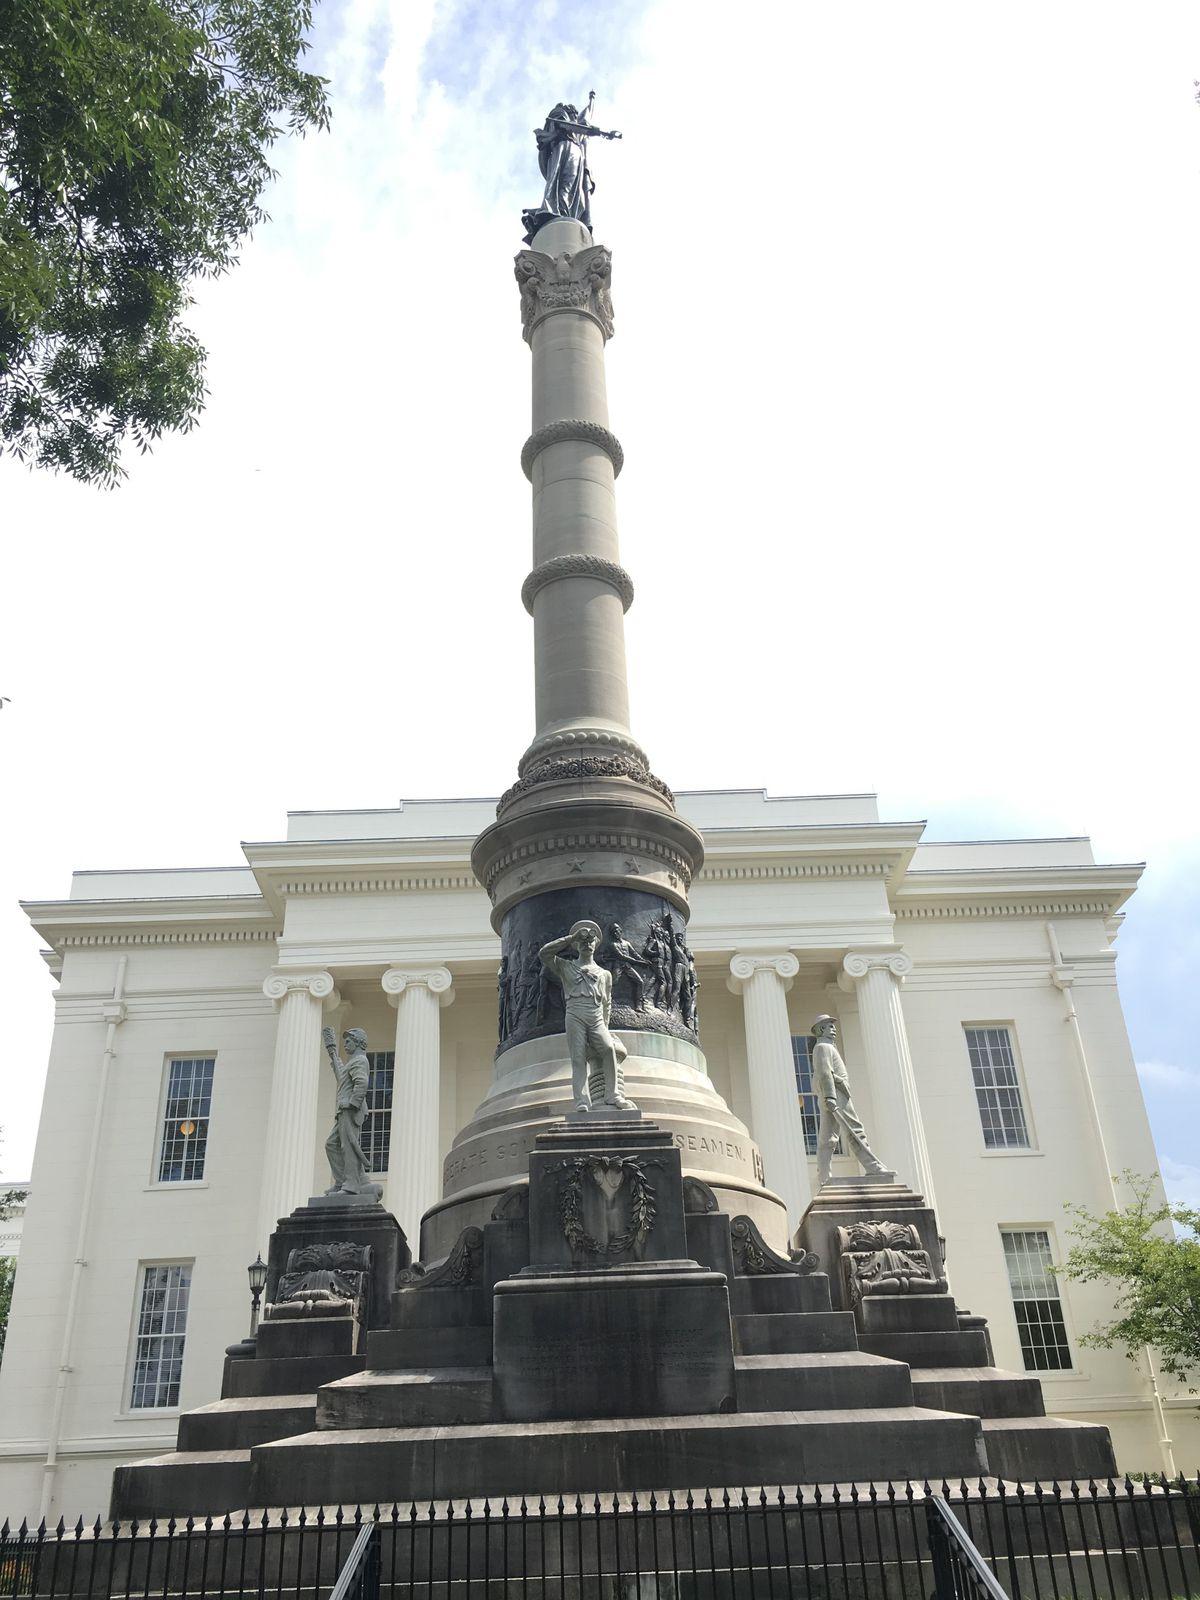 The Confederate monument in Montgomery, Alabama